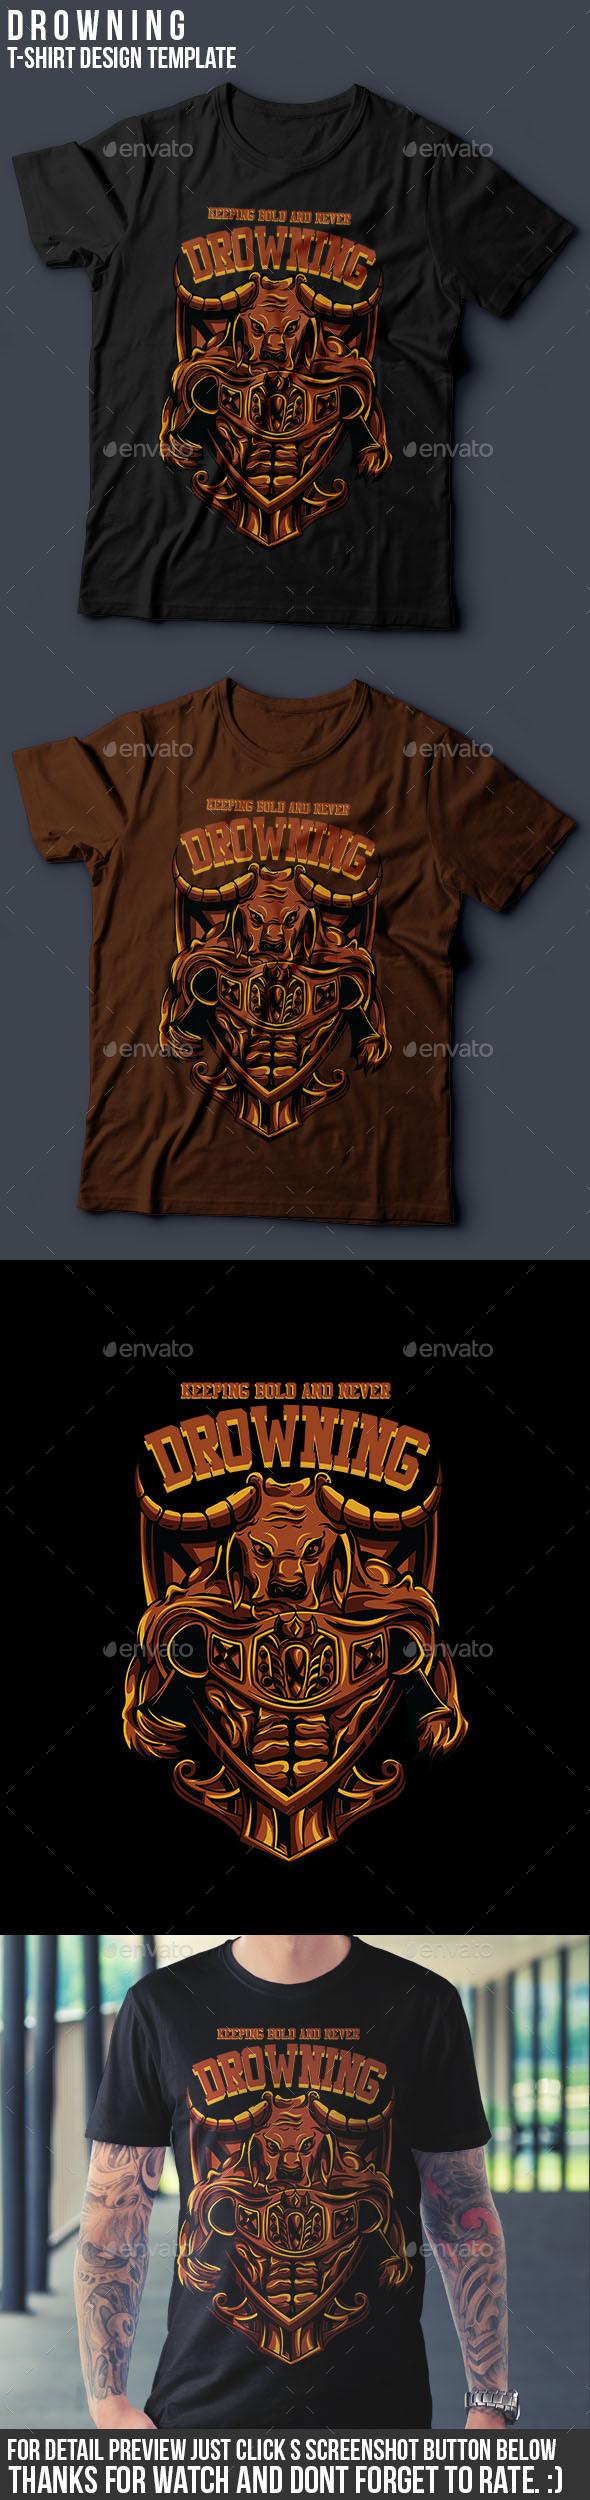 Drowning T-Shirt Design - Sports & Teams T-Shirts